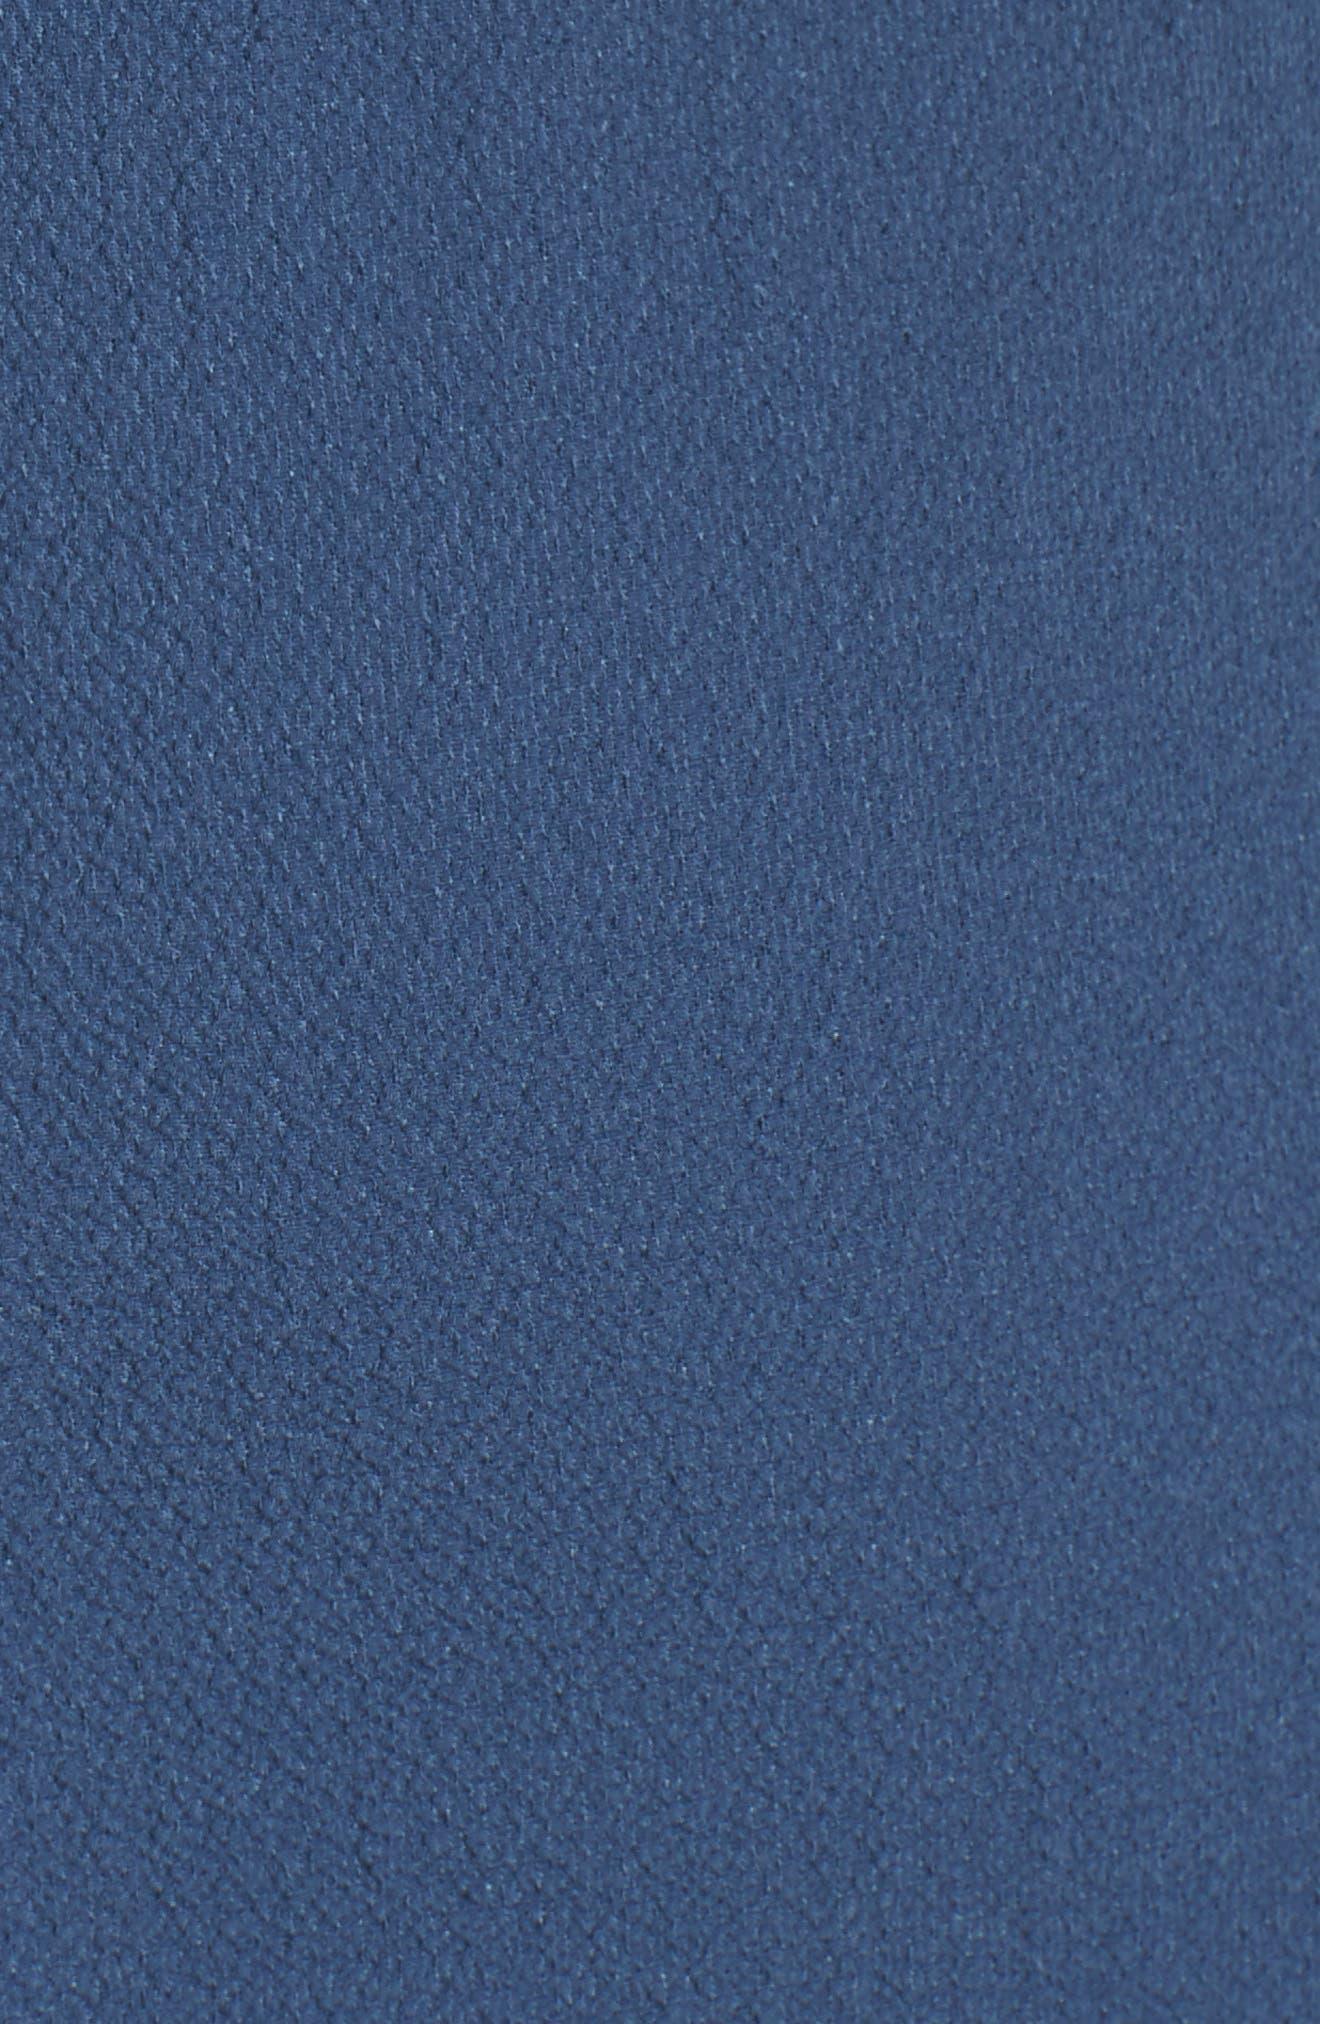 Wrap Midi Dress,                             Alternate thumbnail 5, color,                             Dusty Teal